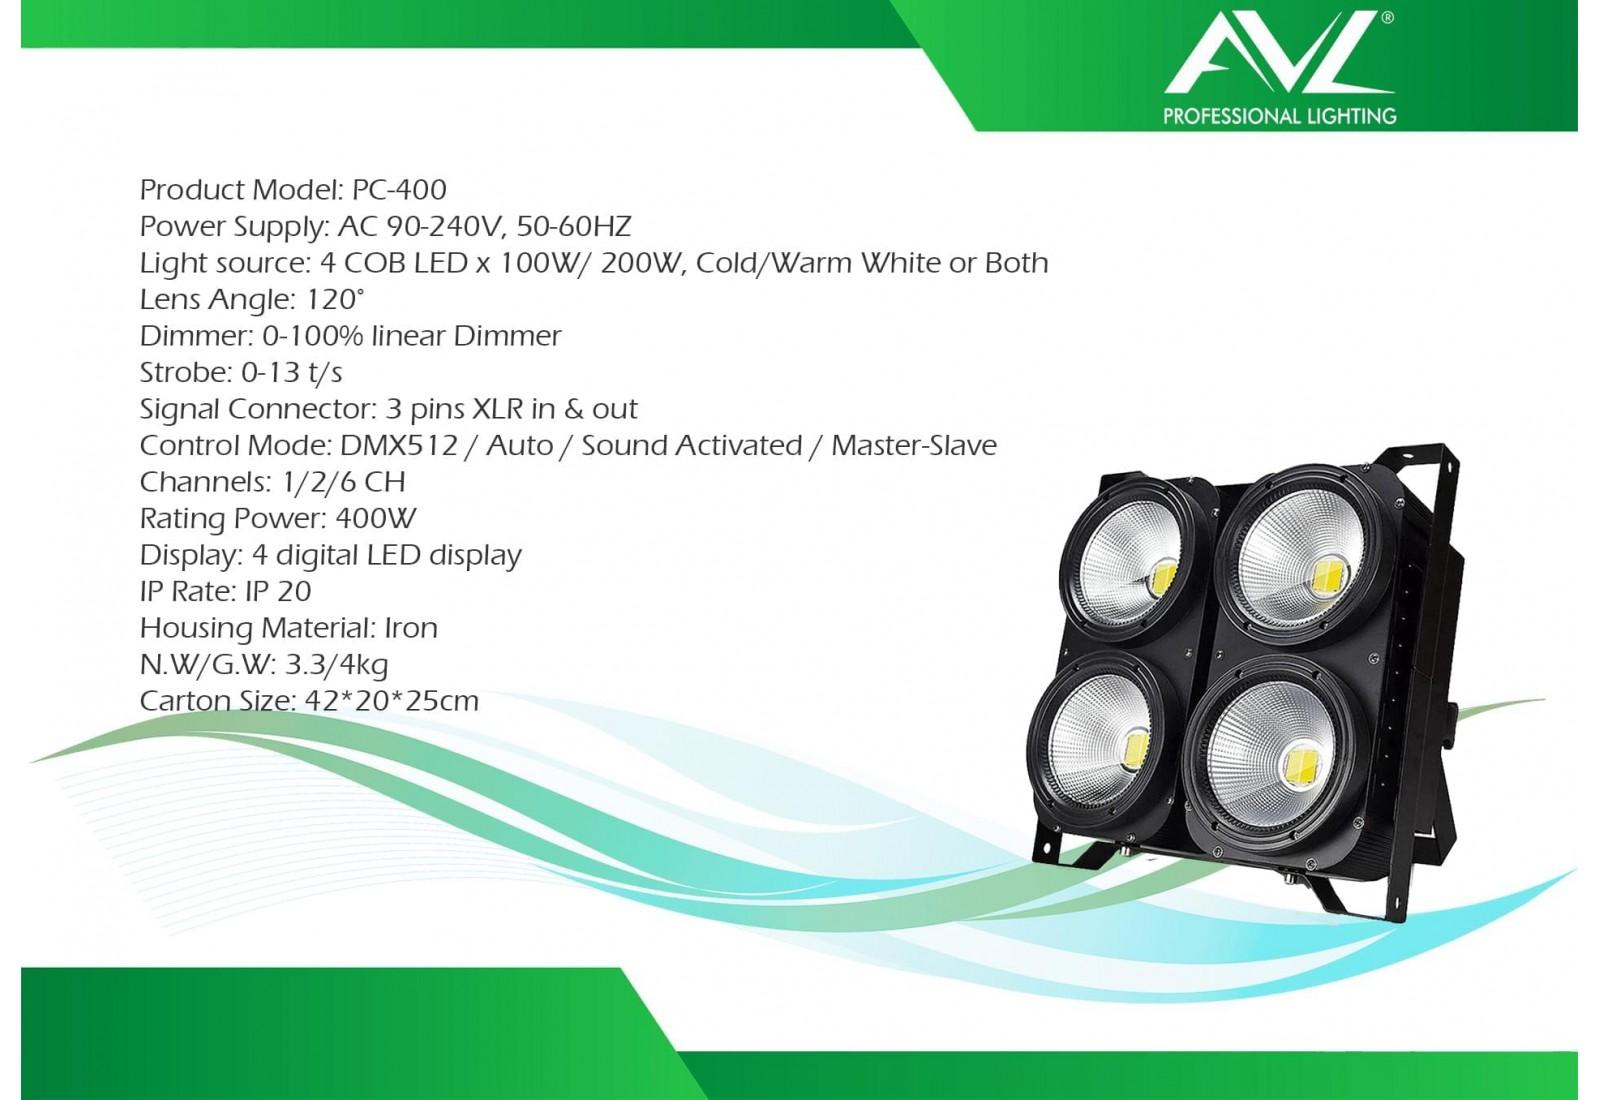 AVL PC 400